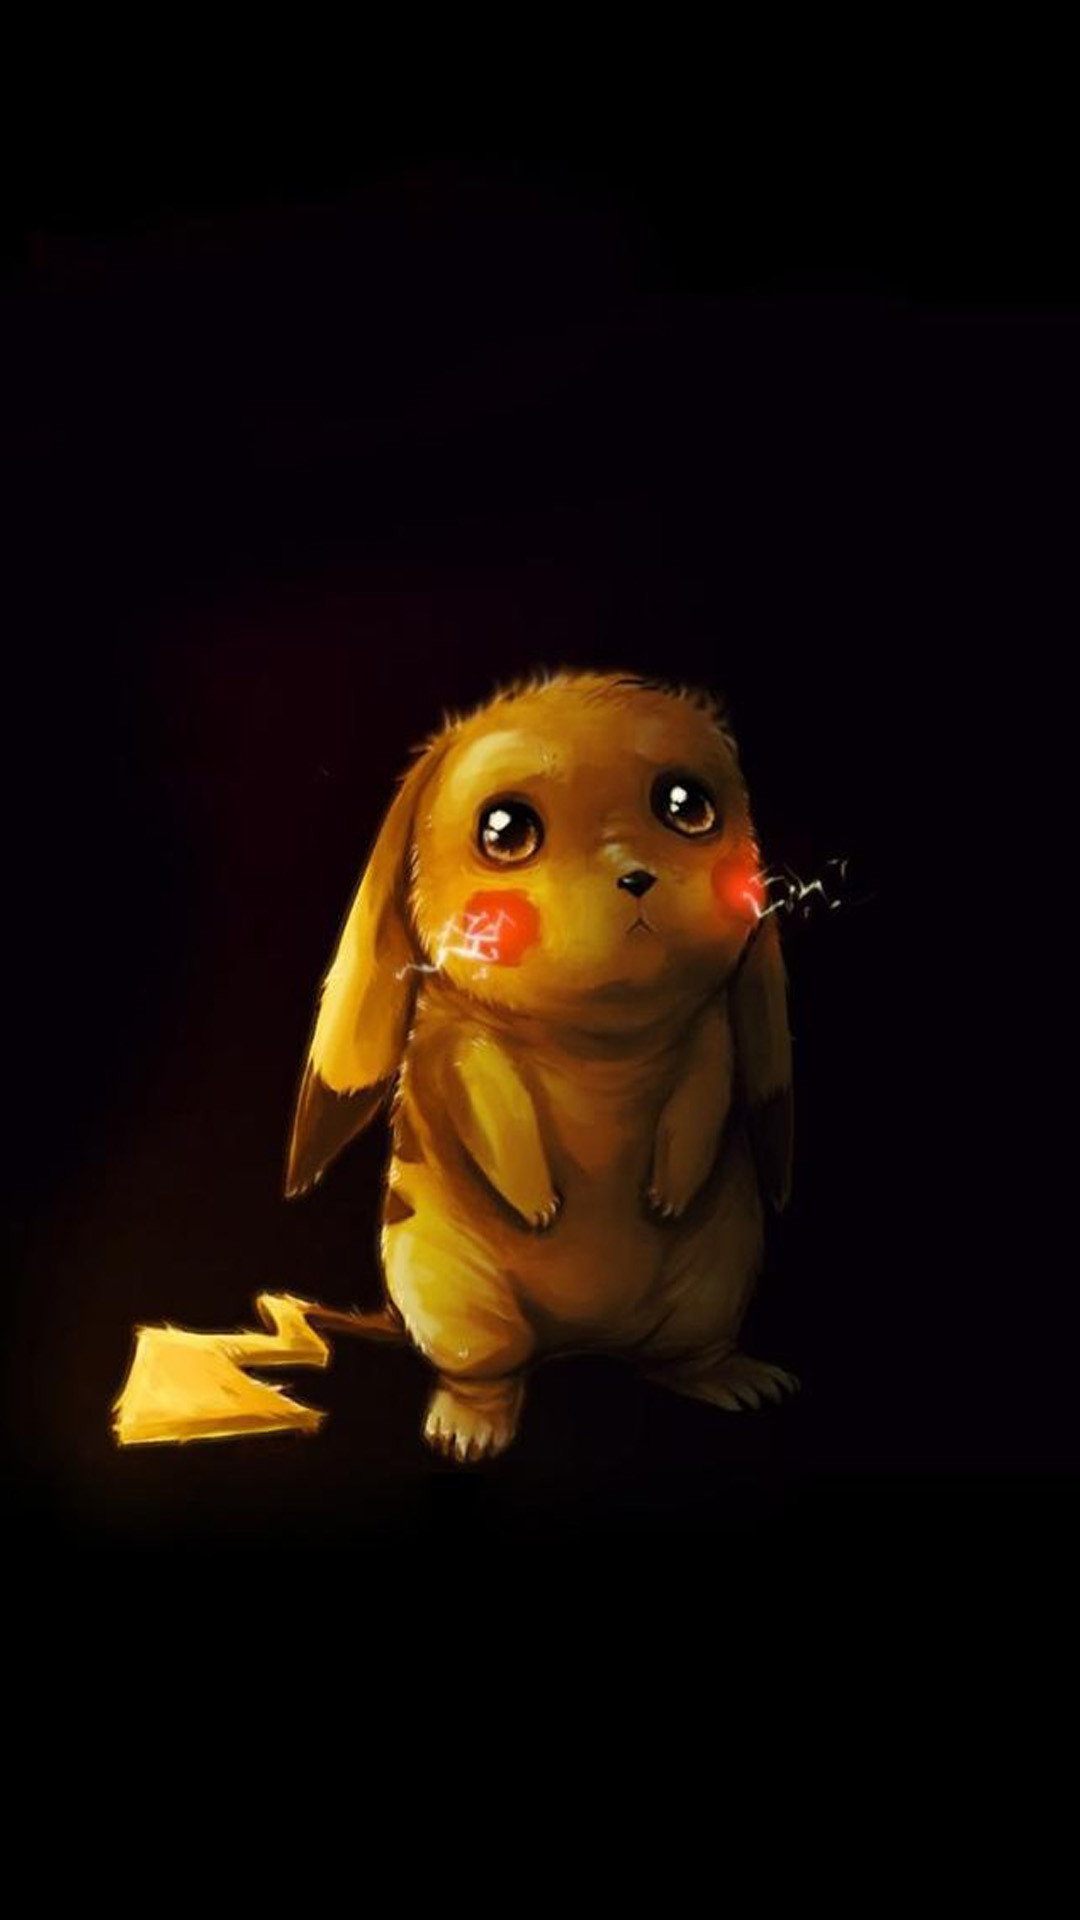 Cute Poor Pikachu #iPhone #6 #plus #wallpaper